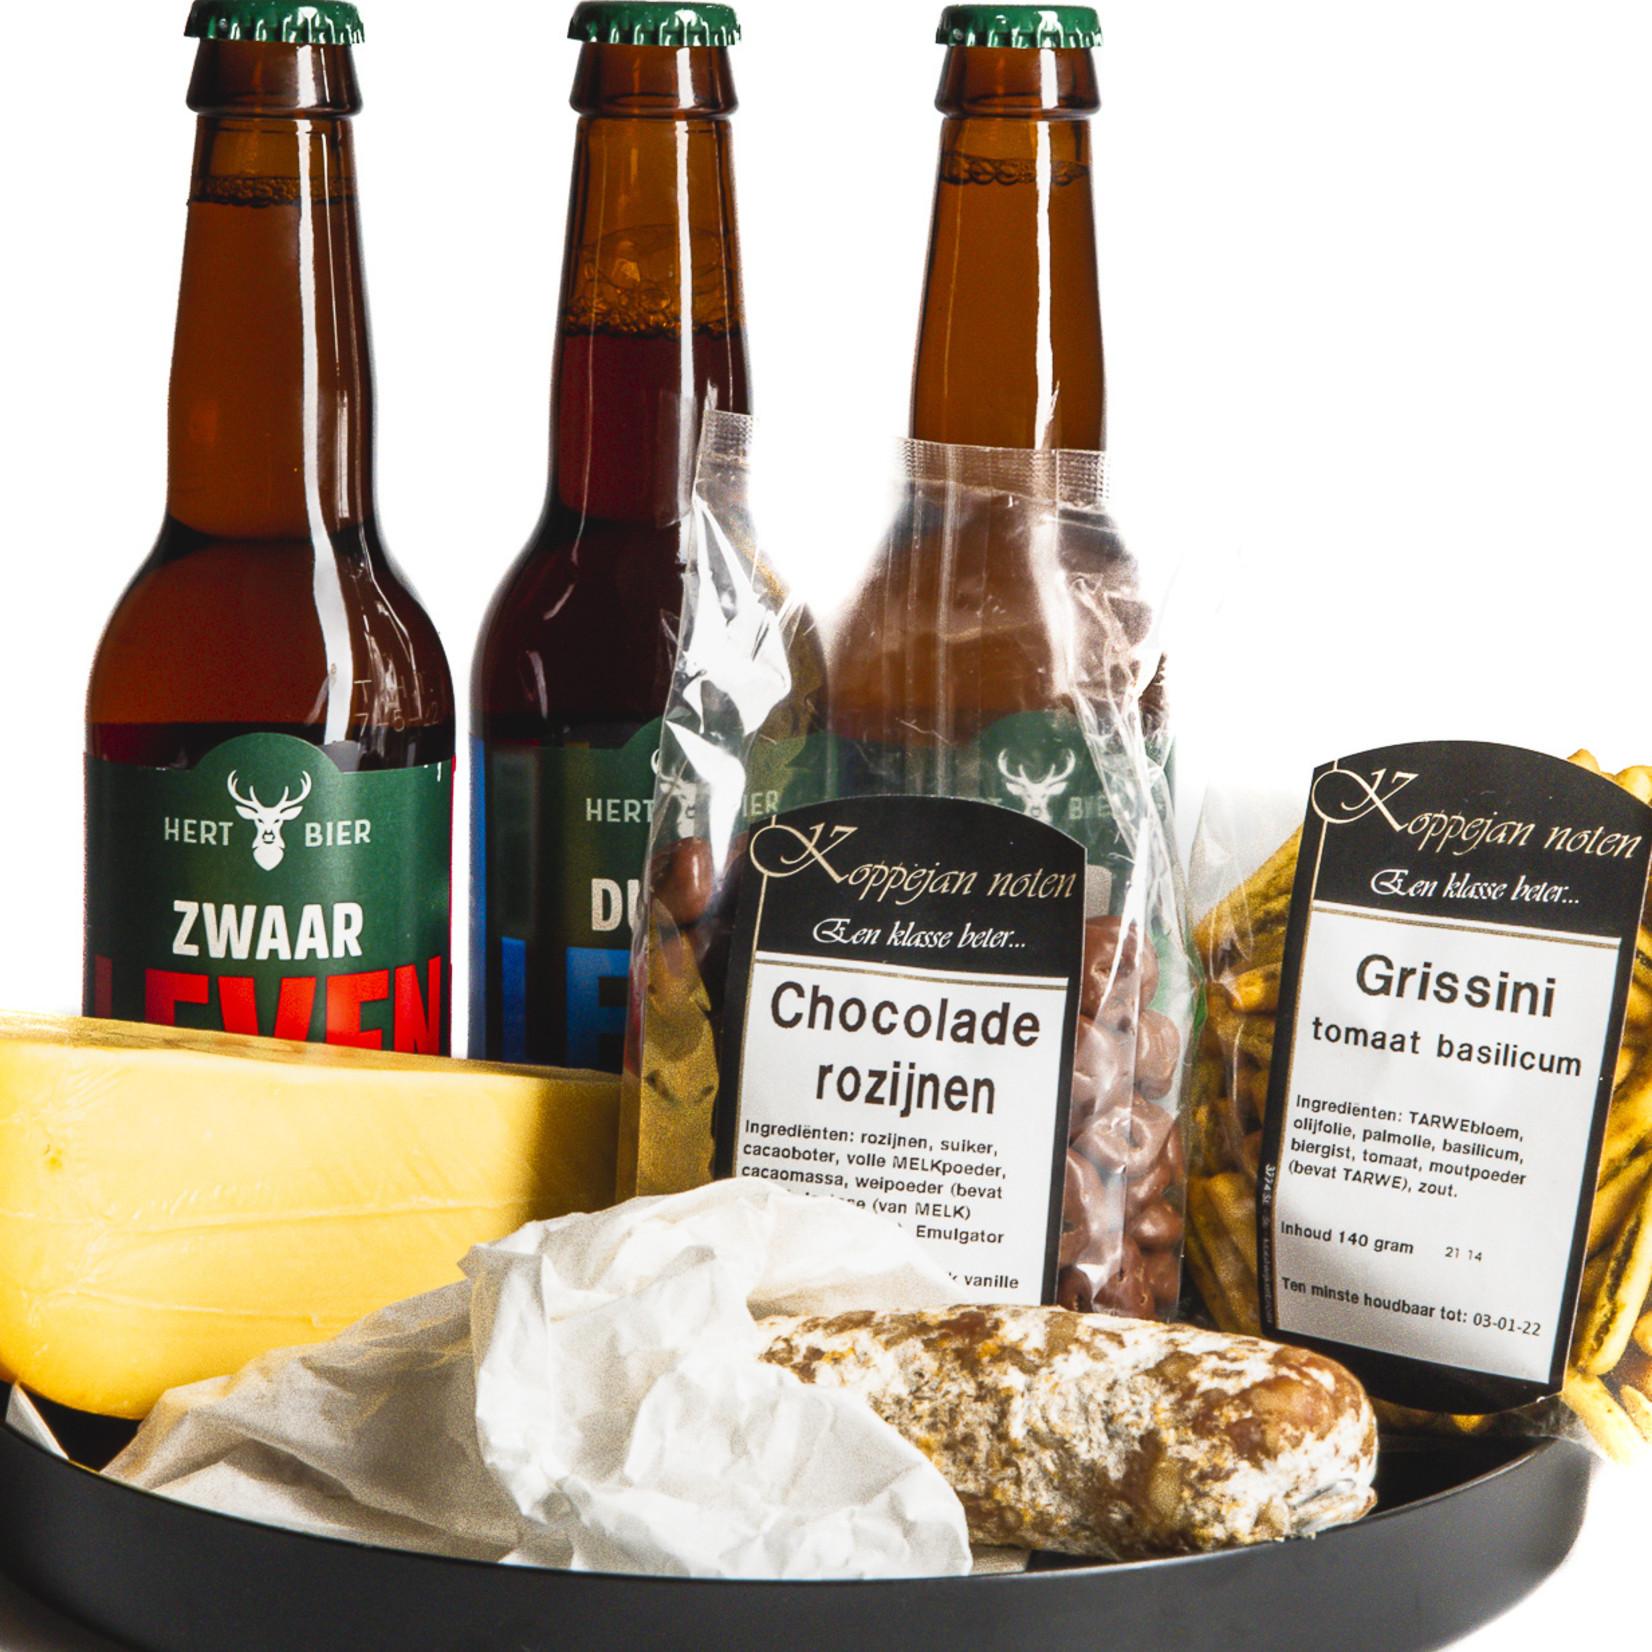 Hert Bier Beers and bites basic